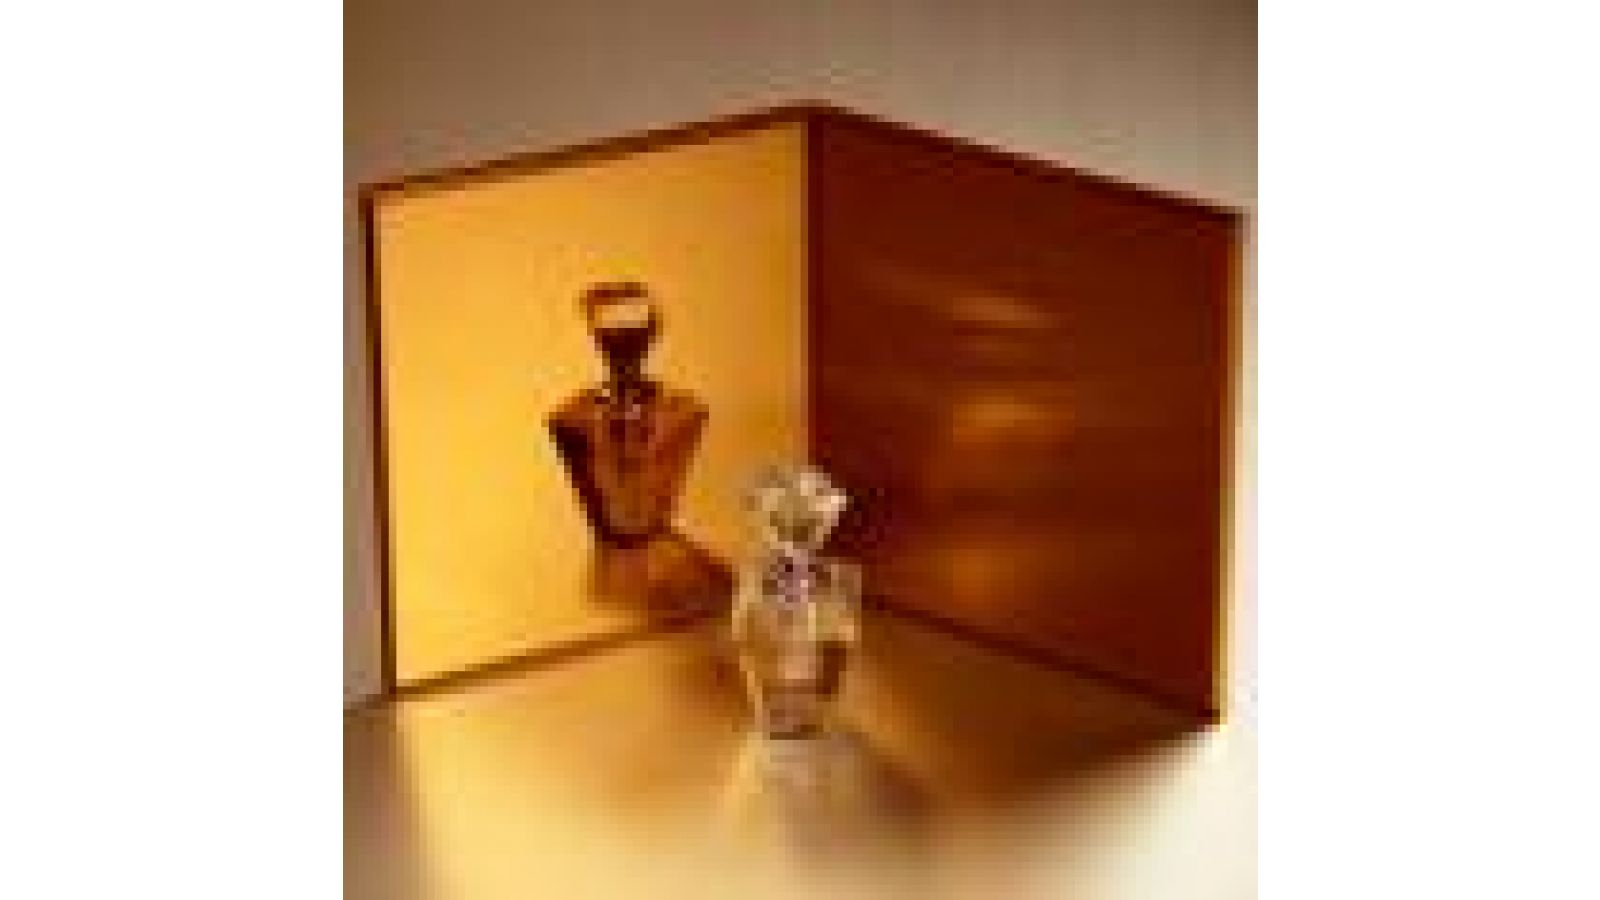 Metal Wall Tile - Cognac Copper Finish